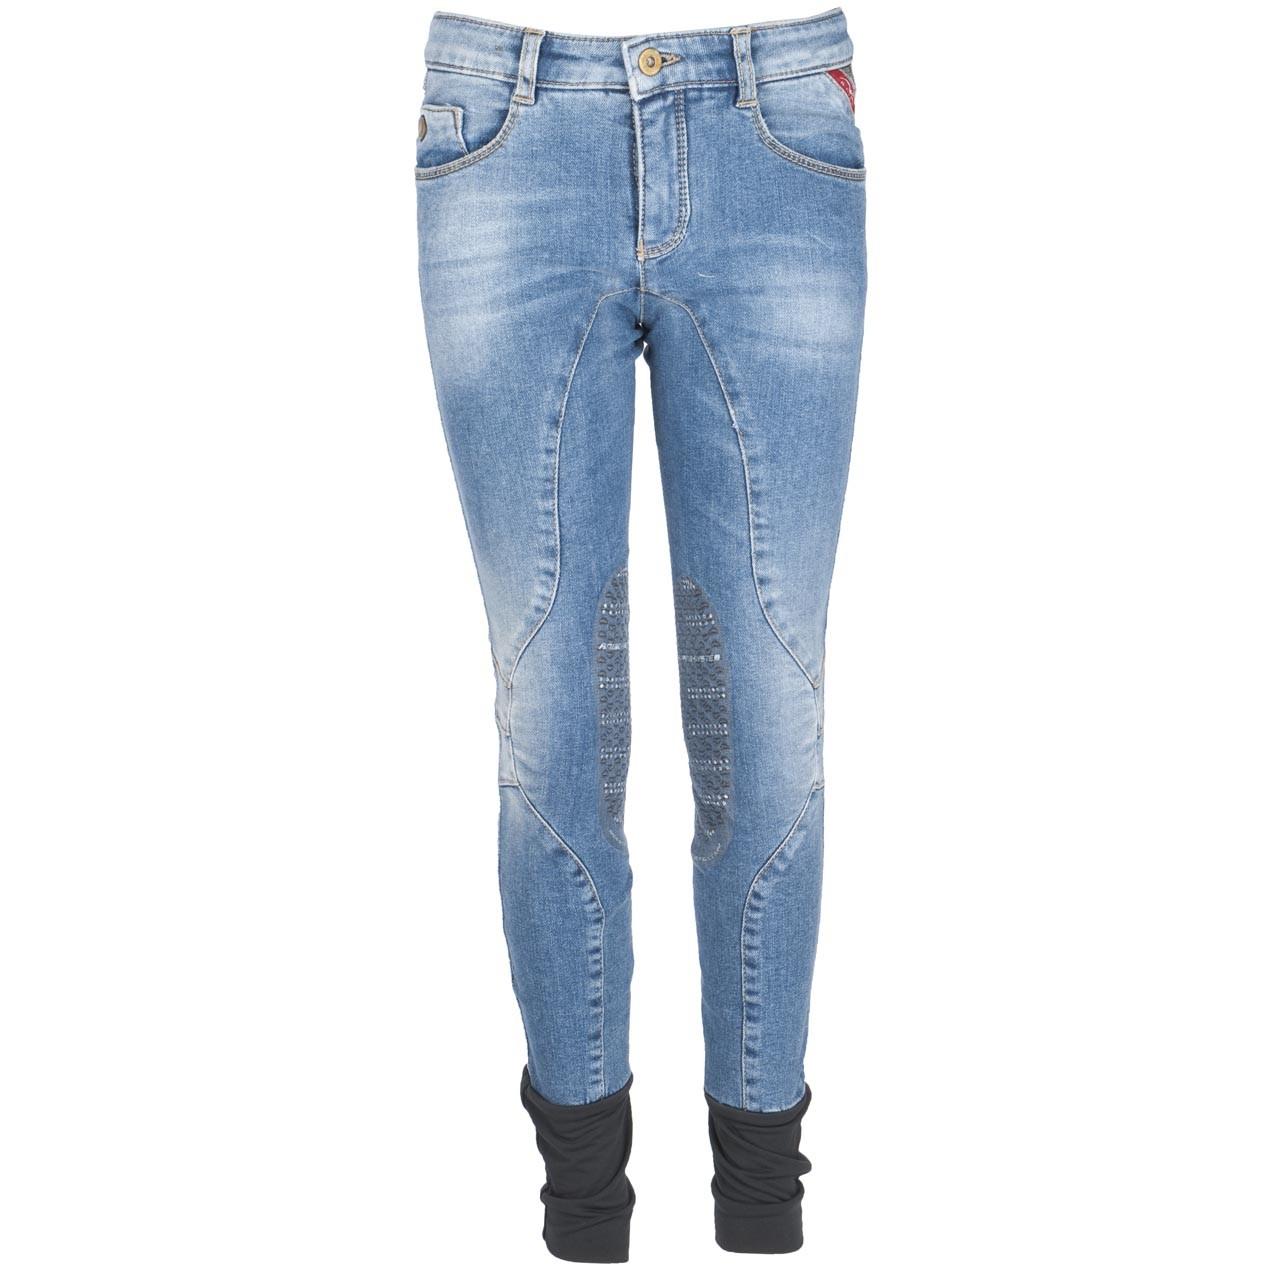 Animo Marnix kinder paardrijbroek jeans maat:164